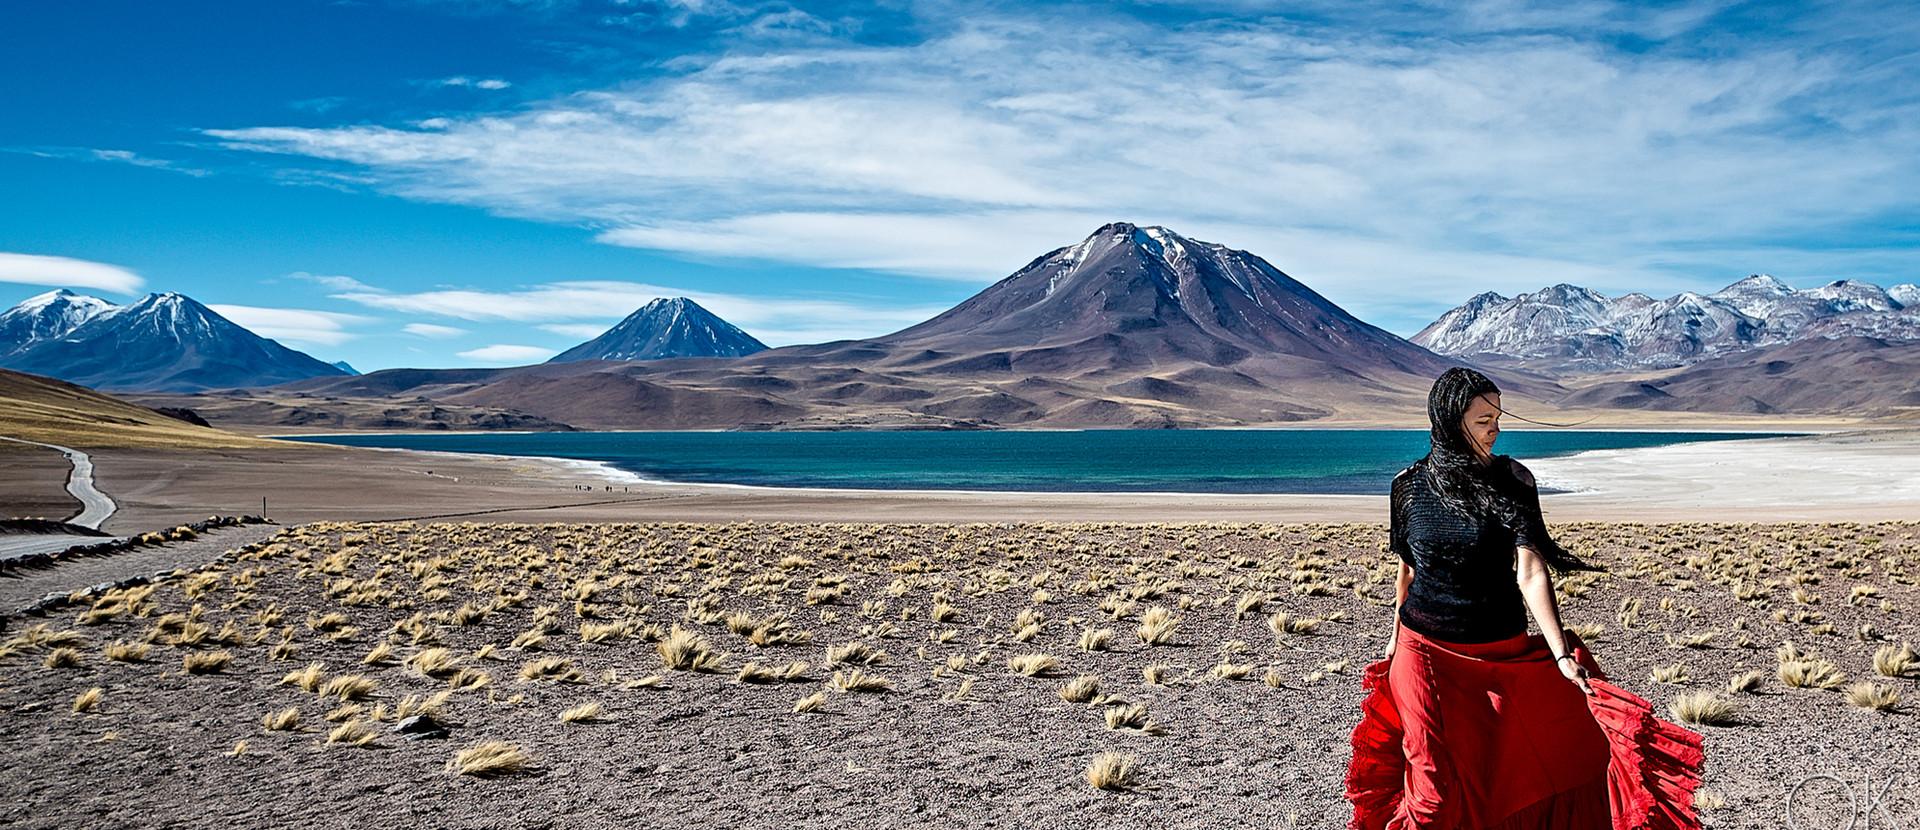 mujer bailando laguna miscanti desierto de atacama lagoon desert volcano woman dancing skirt dress blue skies portrait retrato